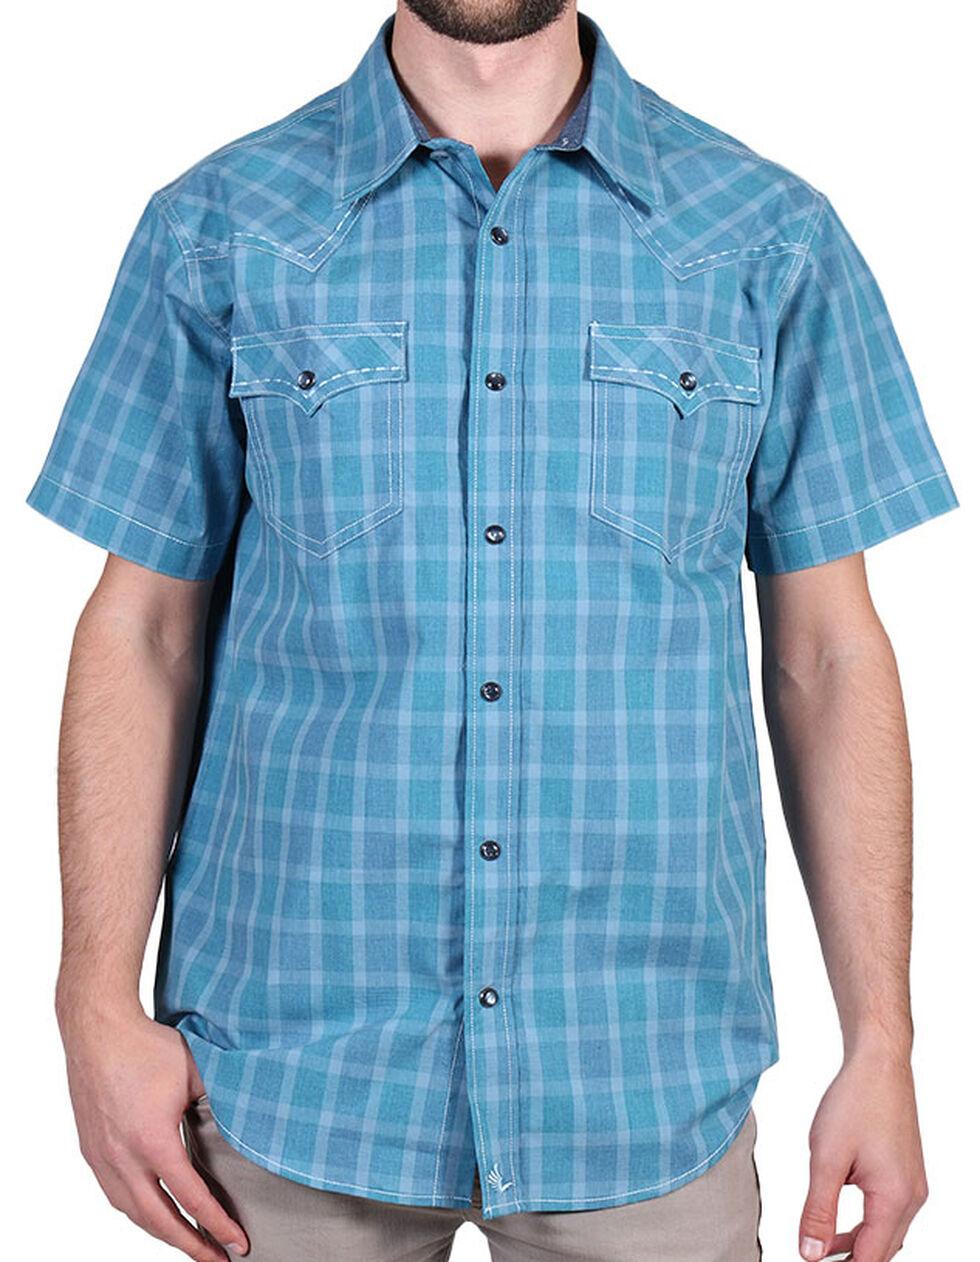 Cody James Men's Plaid Print Short Sleeve Shirt, Blue, hi-res